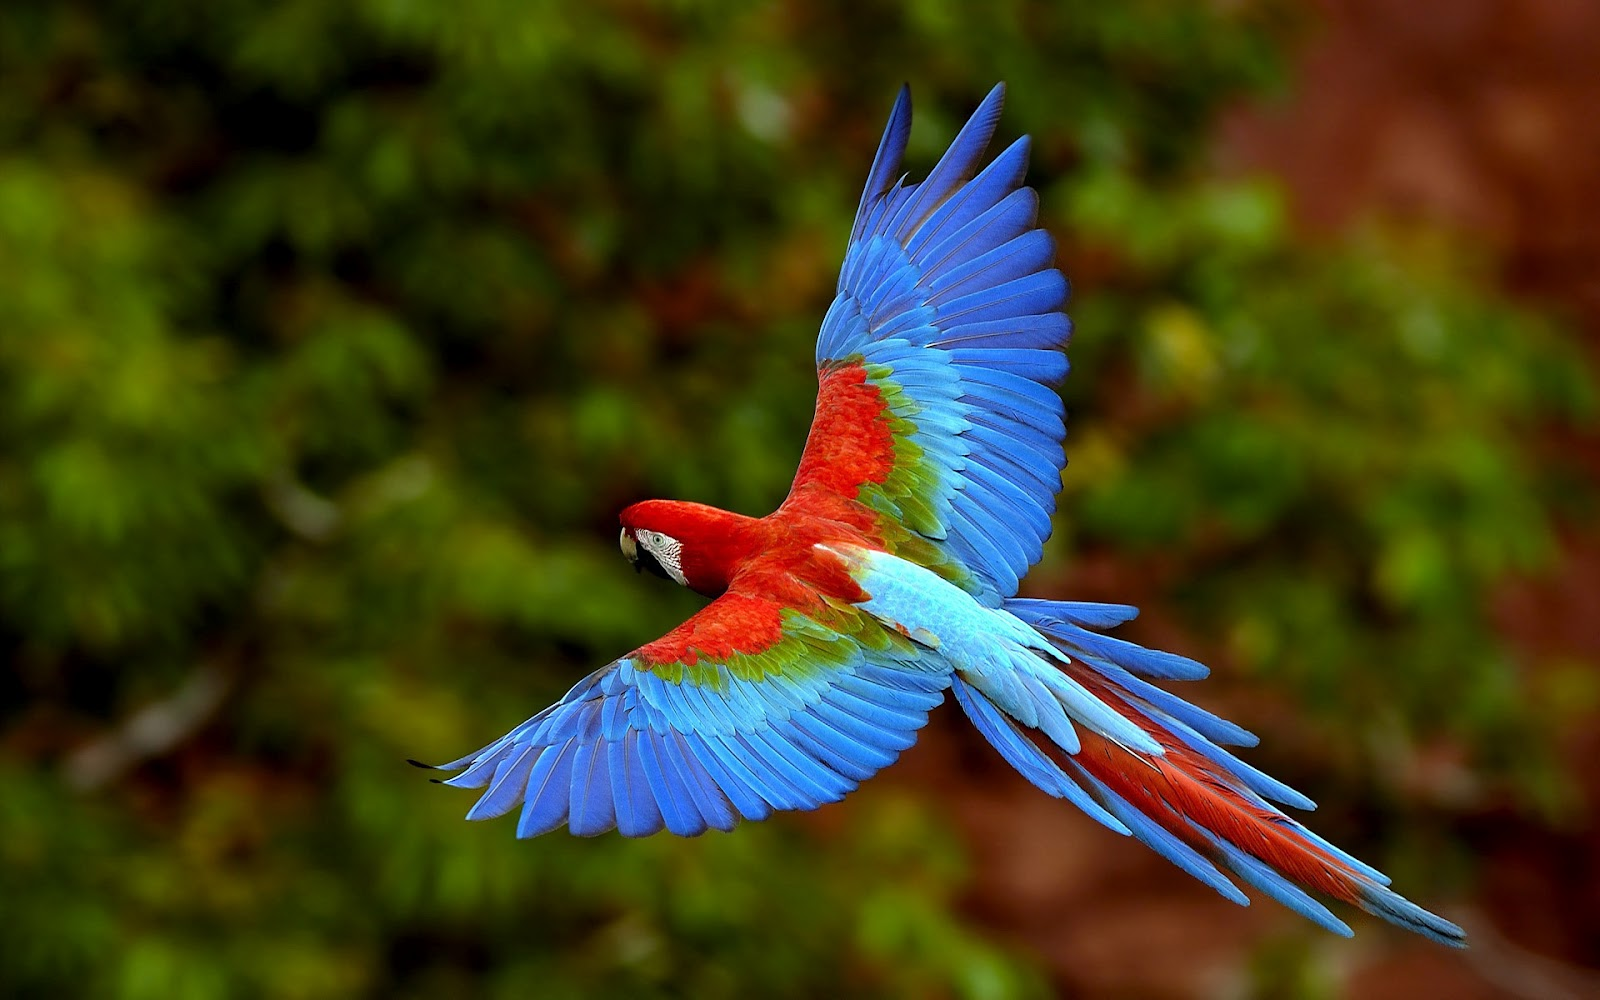 Bird Pictures Amazing Birds: Wildlife Of The World: Beautiful Parrot Wallpapers 2012